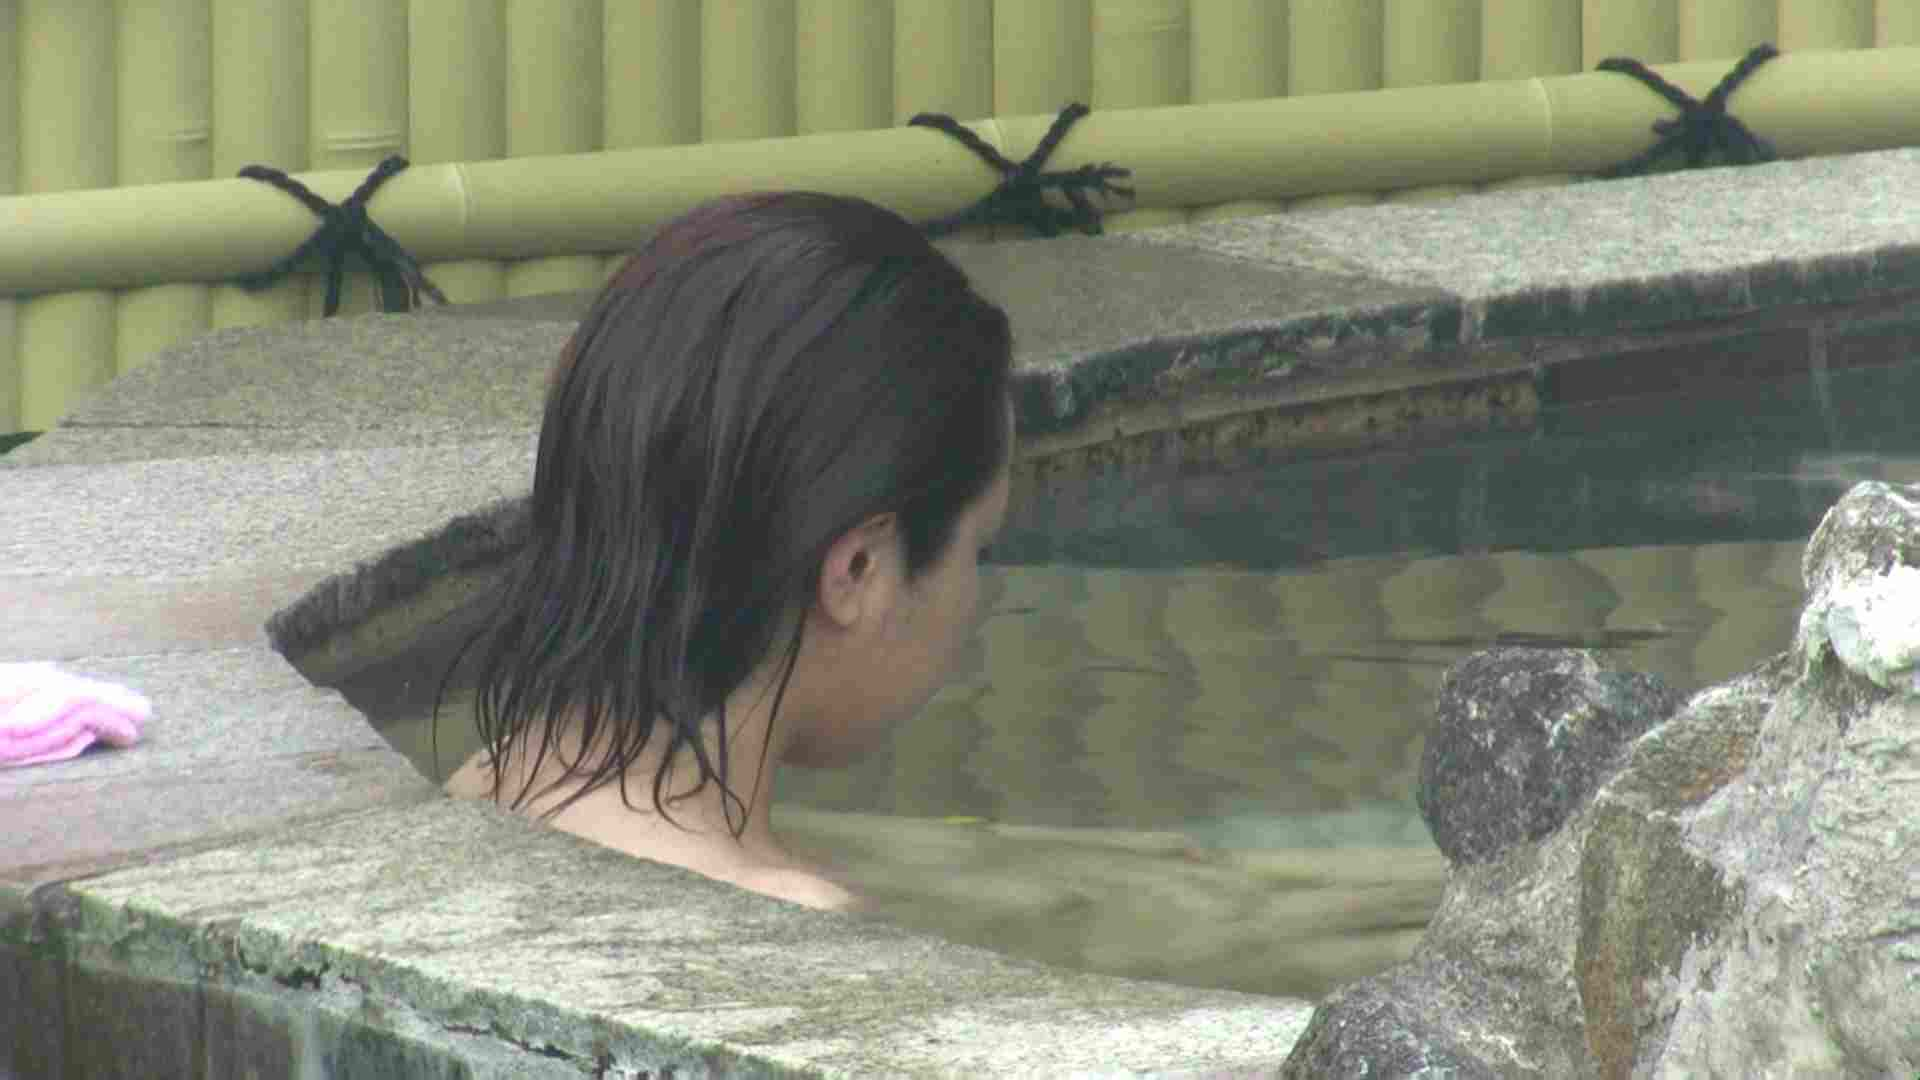 Aquaな露天風呂Vol.604 OLのエロ生活 オメコ動画キャプチャ 84連発 50